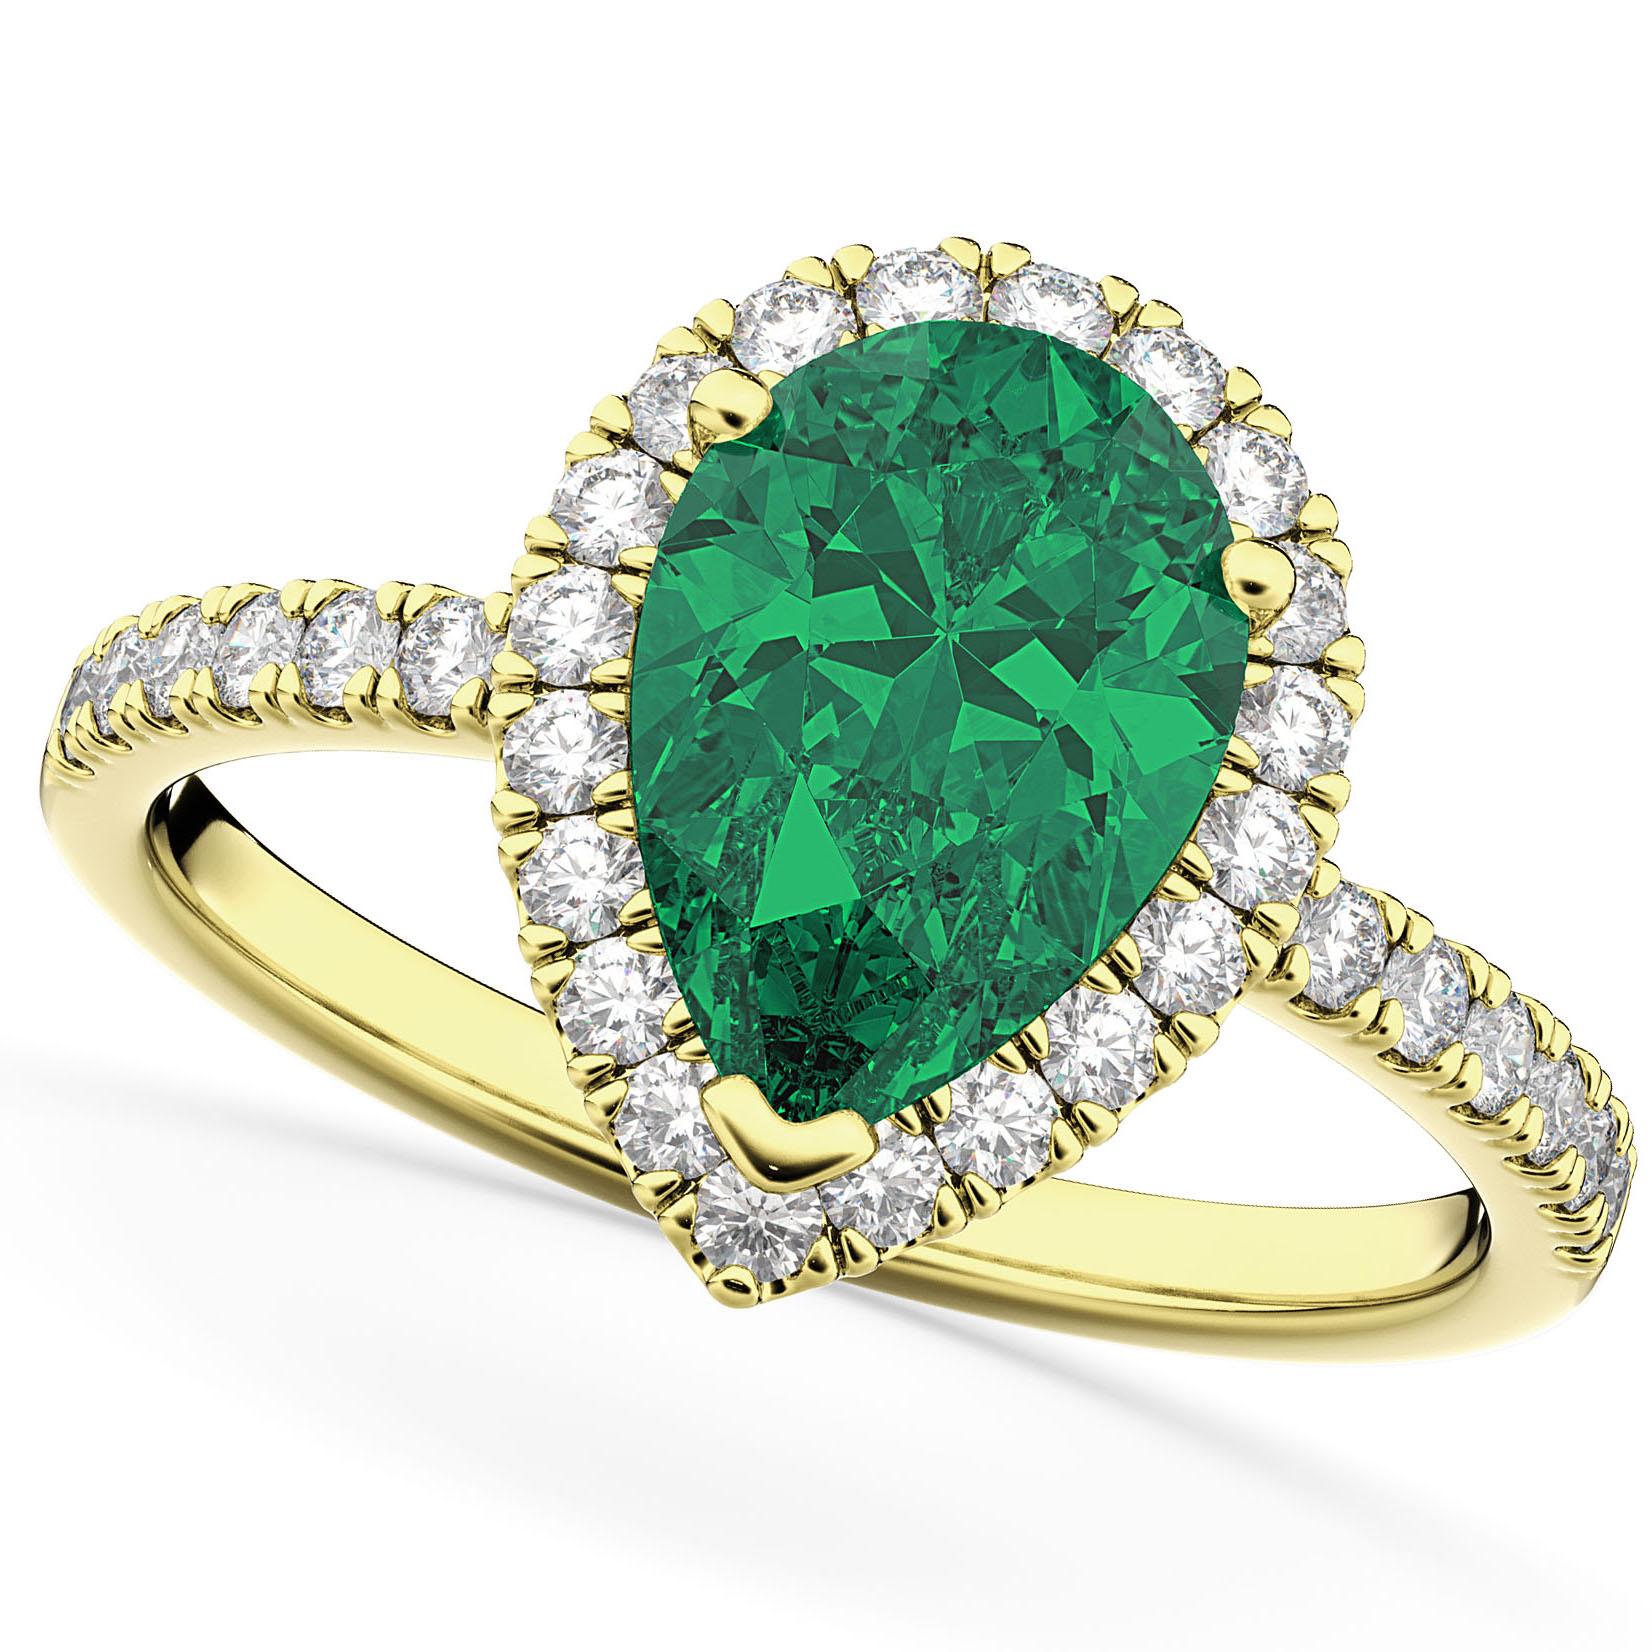 Pear Cut Halo Emerald & Diamond Engagement Ring 14K Yellow Gold 3.21ct